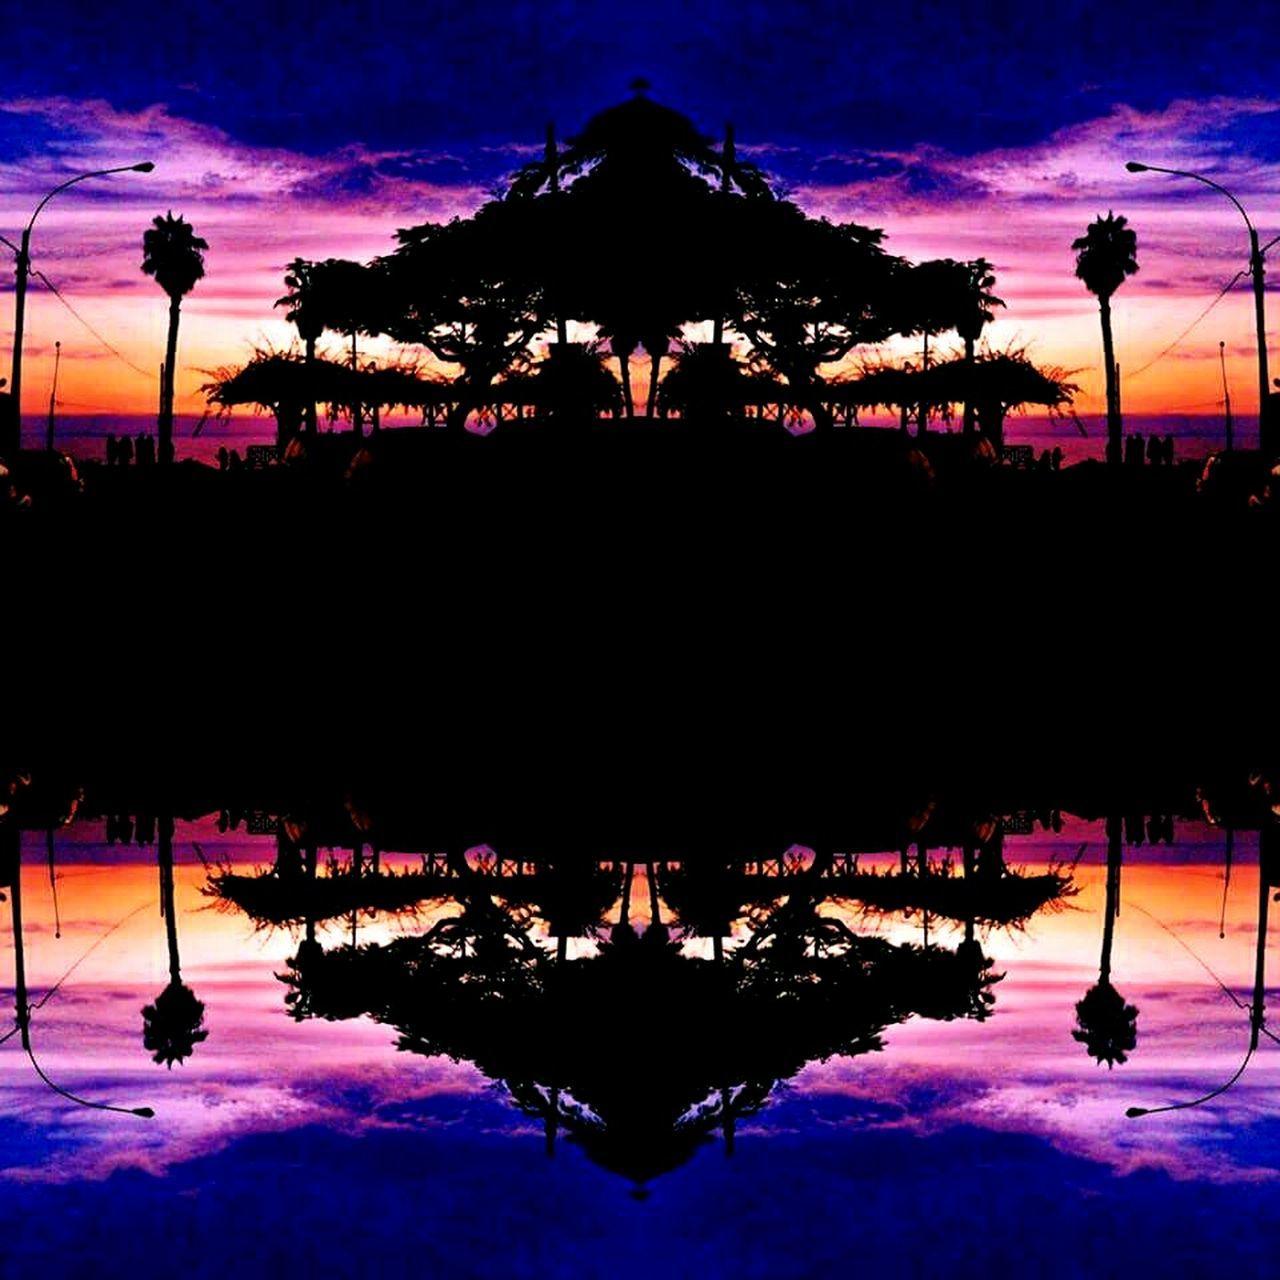 Atardecer paralelo Atardecer Sol Verano Paralelo Nature Tree Reflection No People Sky Symmetry Silhouette Water Cloud - Sky Naturaleza Photography Photo Natural Nature Photography First Eyeem Photo